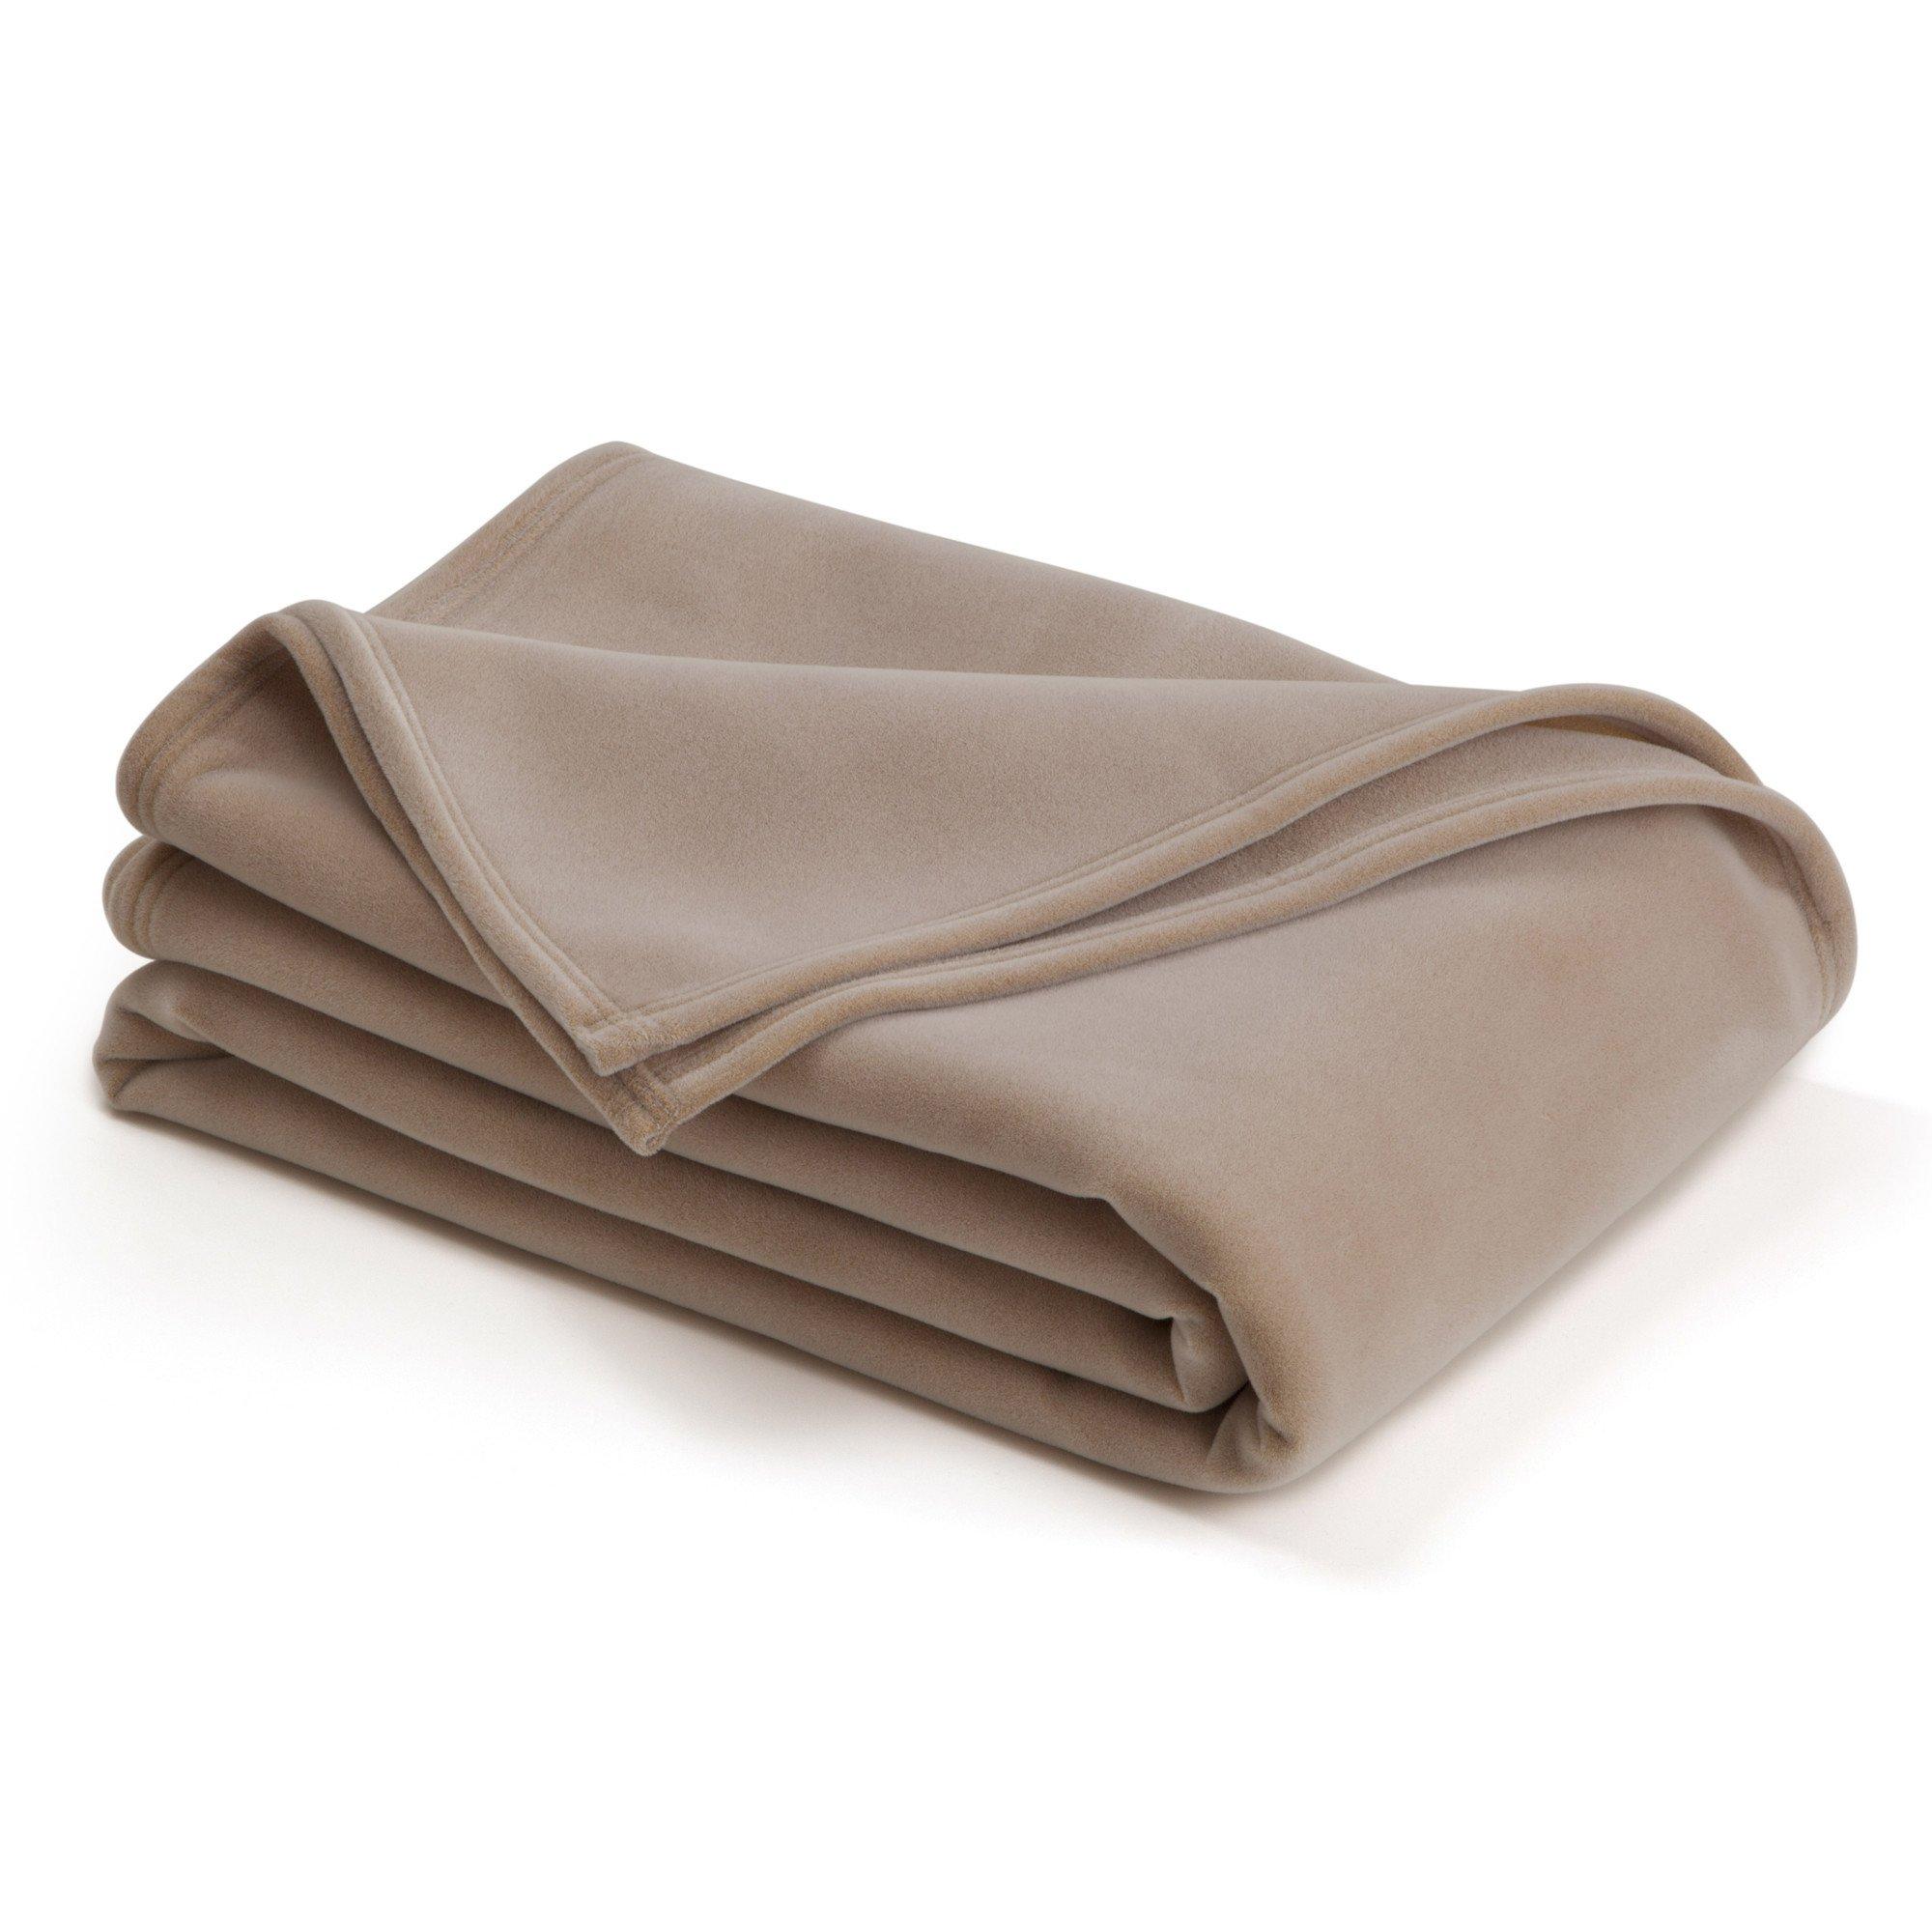 Vellux original king blanket tan ebay for Vellux blanket